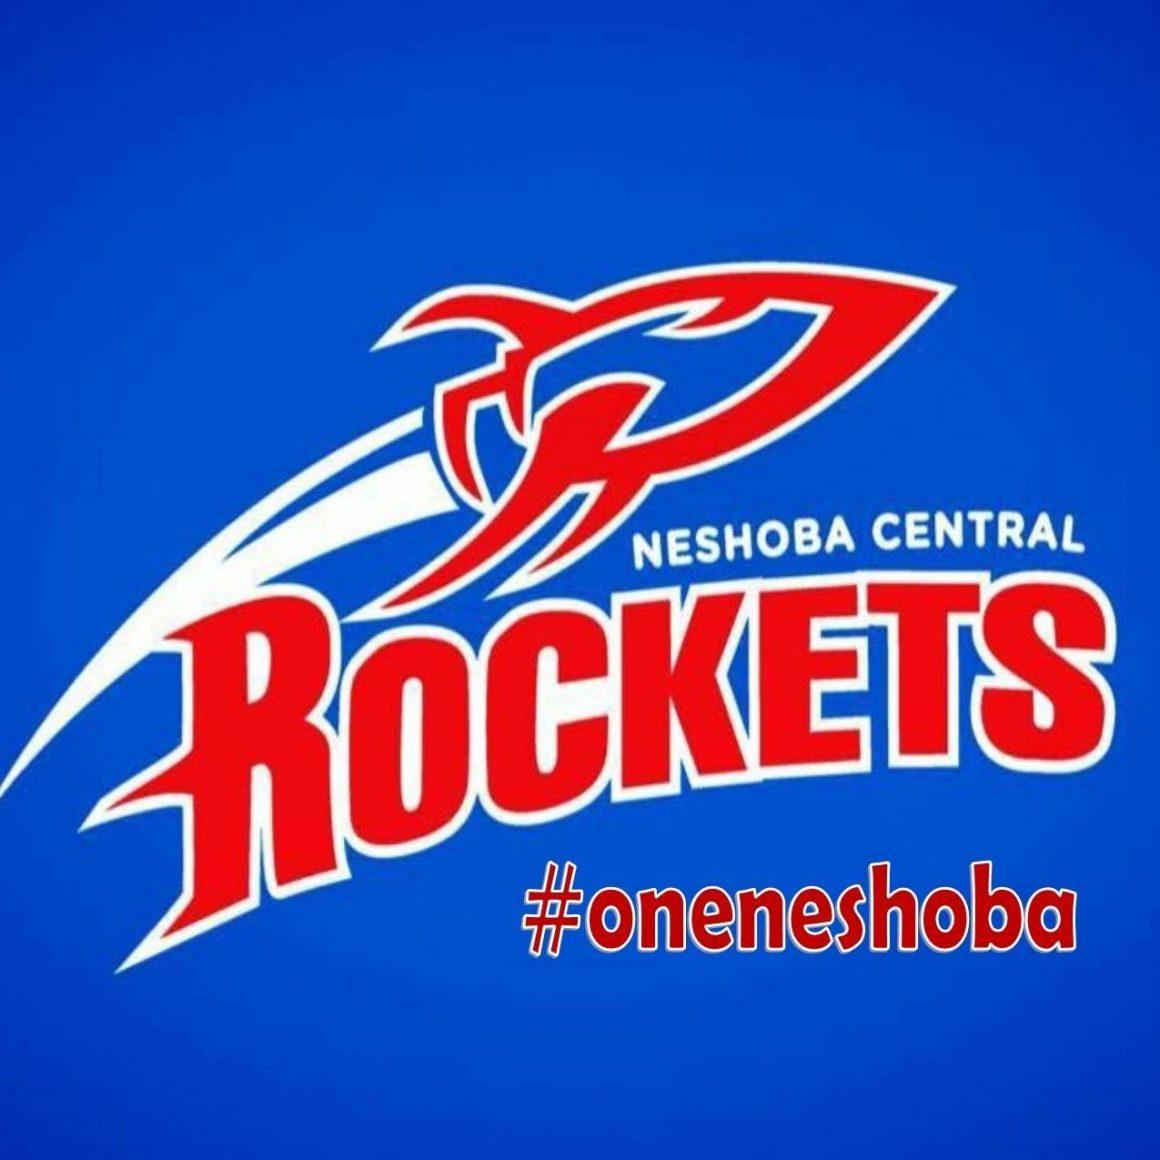 $2.5 million renovation at Neshoba Central